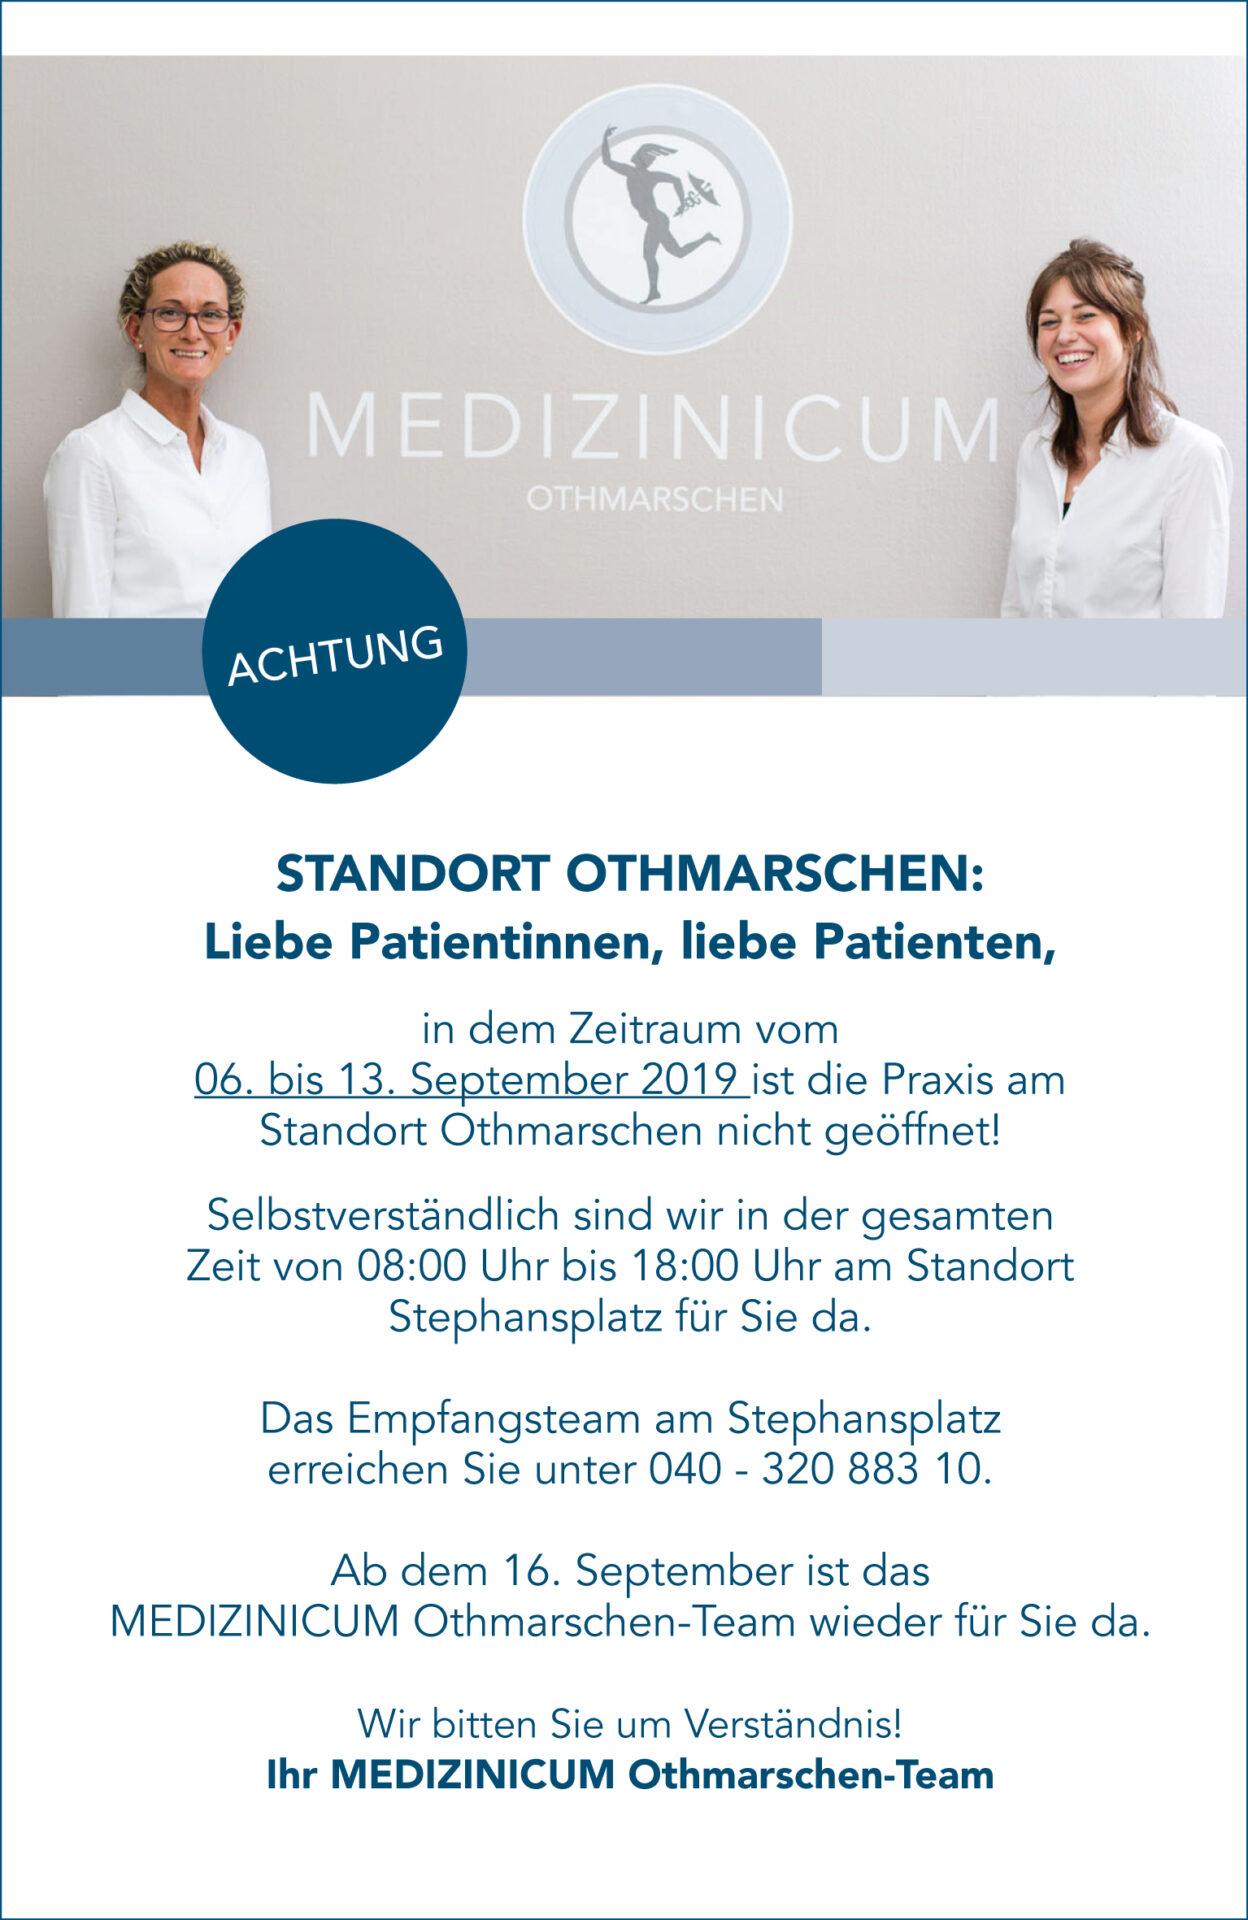 Standort Othmarschen geschlossen PopUp Hinweis - MEDIZINICUM Hamburg